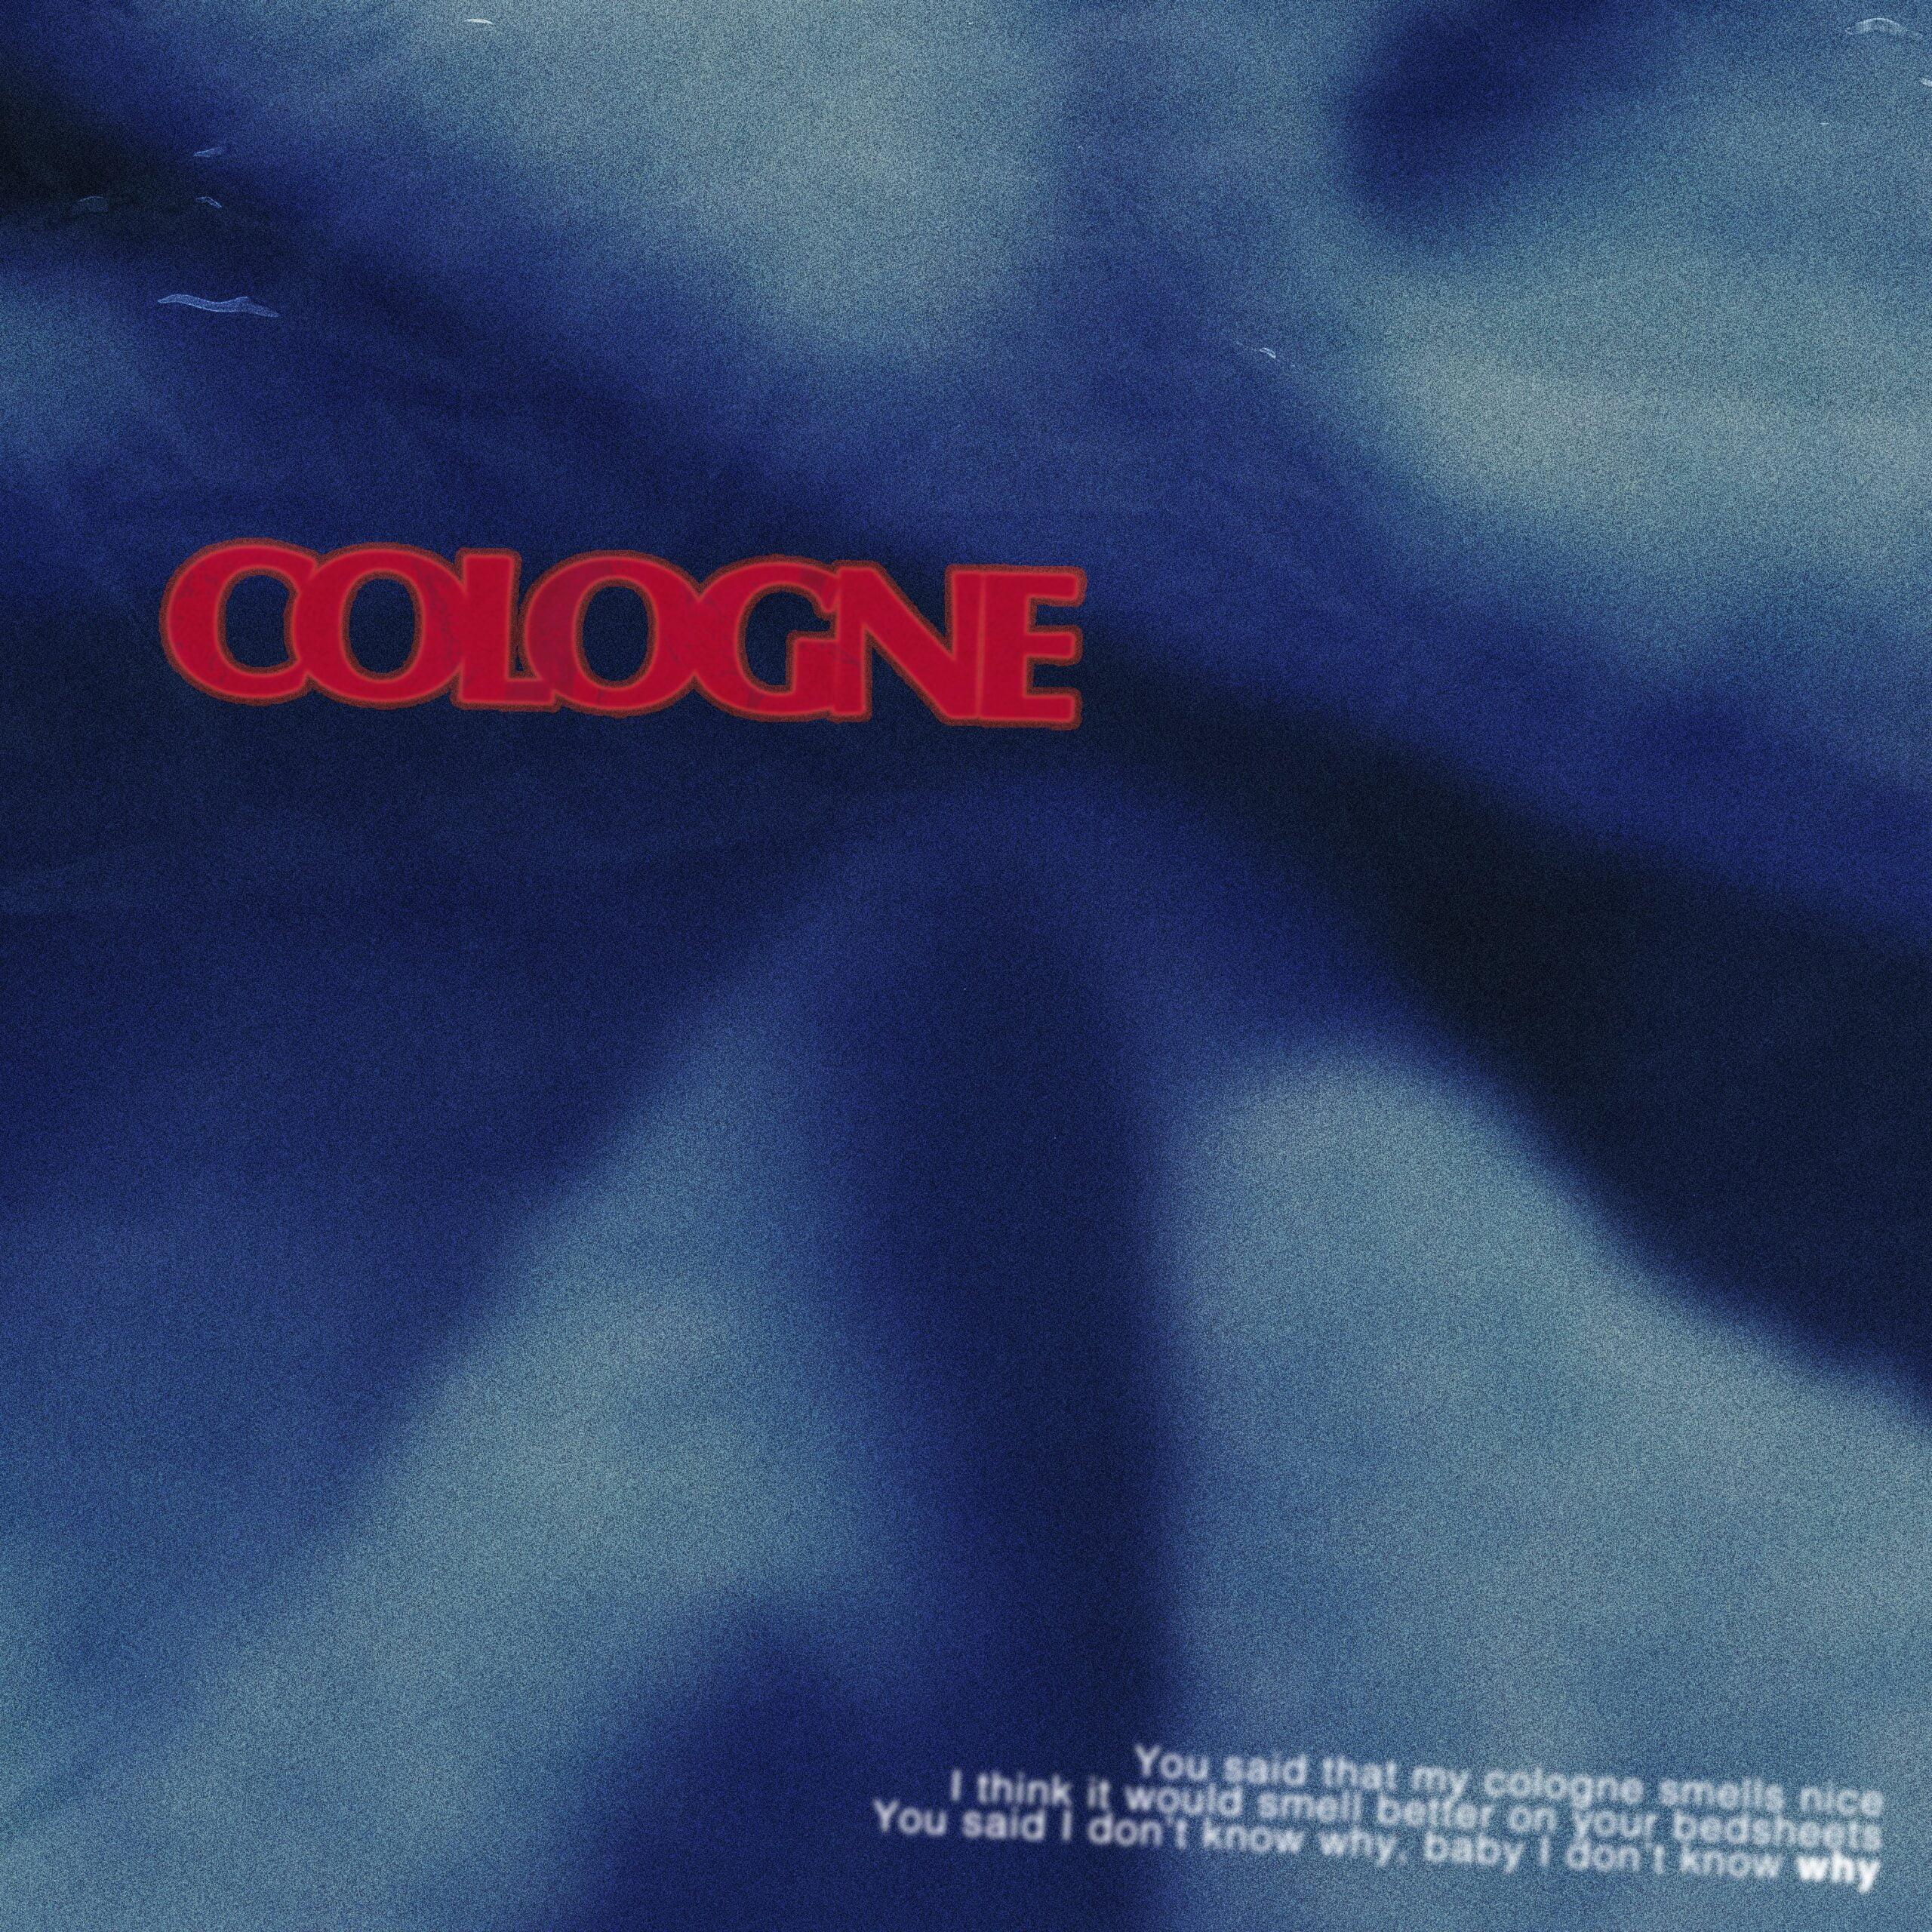 cologne, alec wigdahl, album cover, 360 magazine, vaughn lowery, abigail baldwin